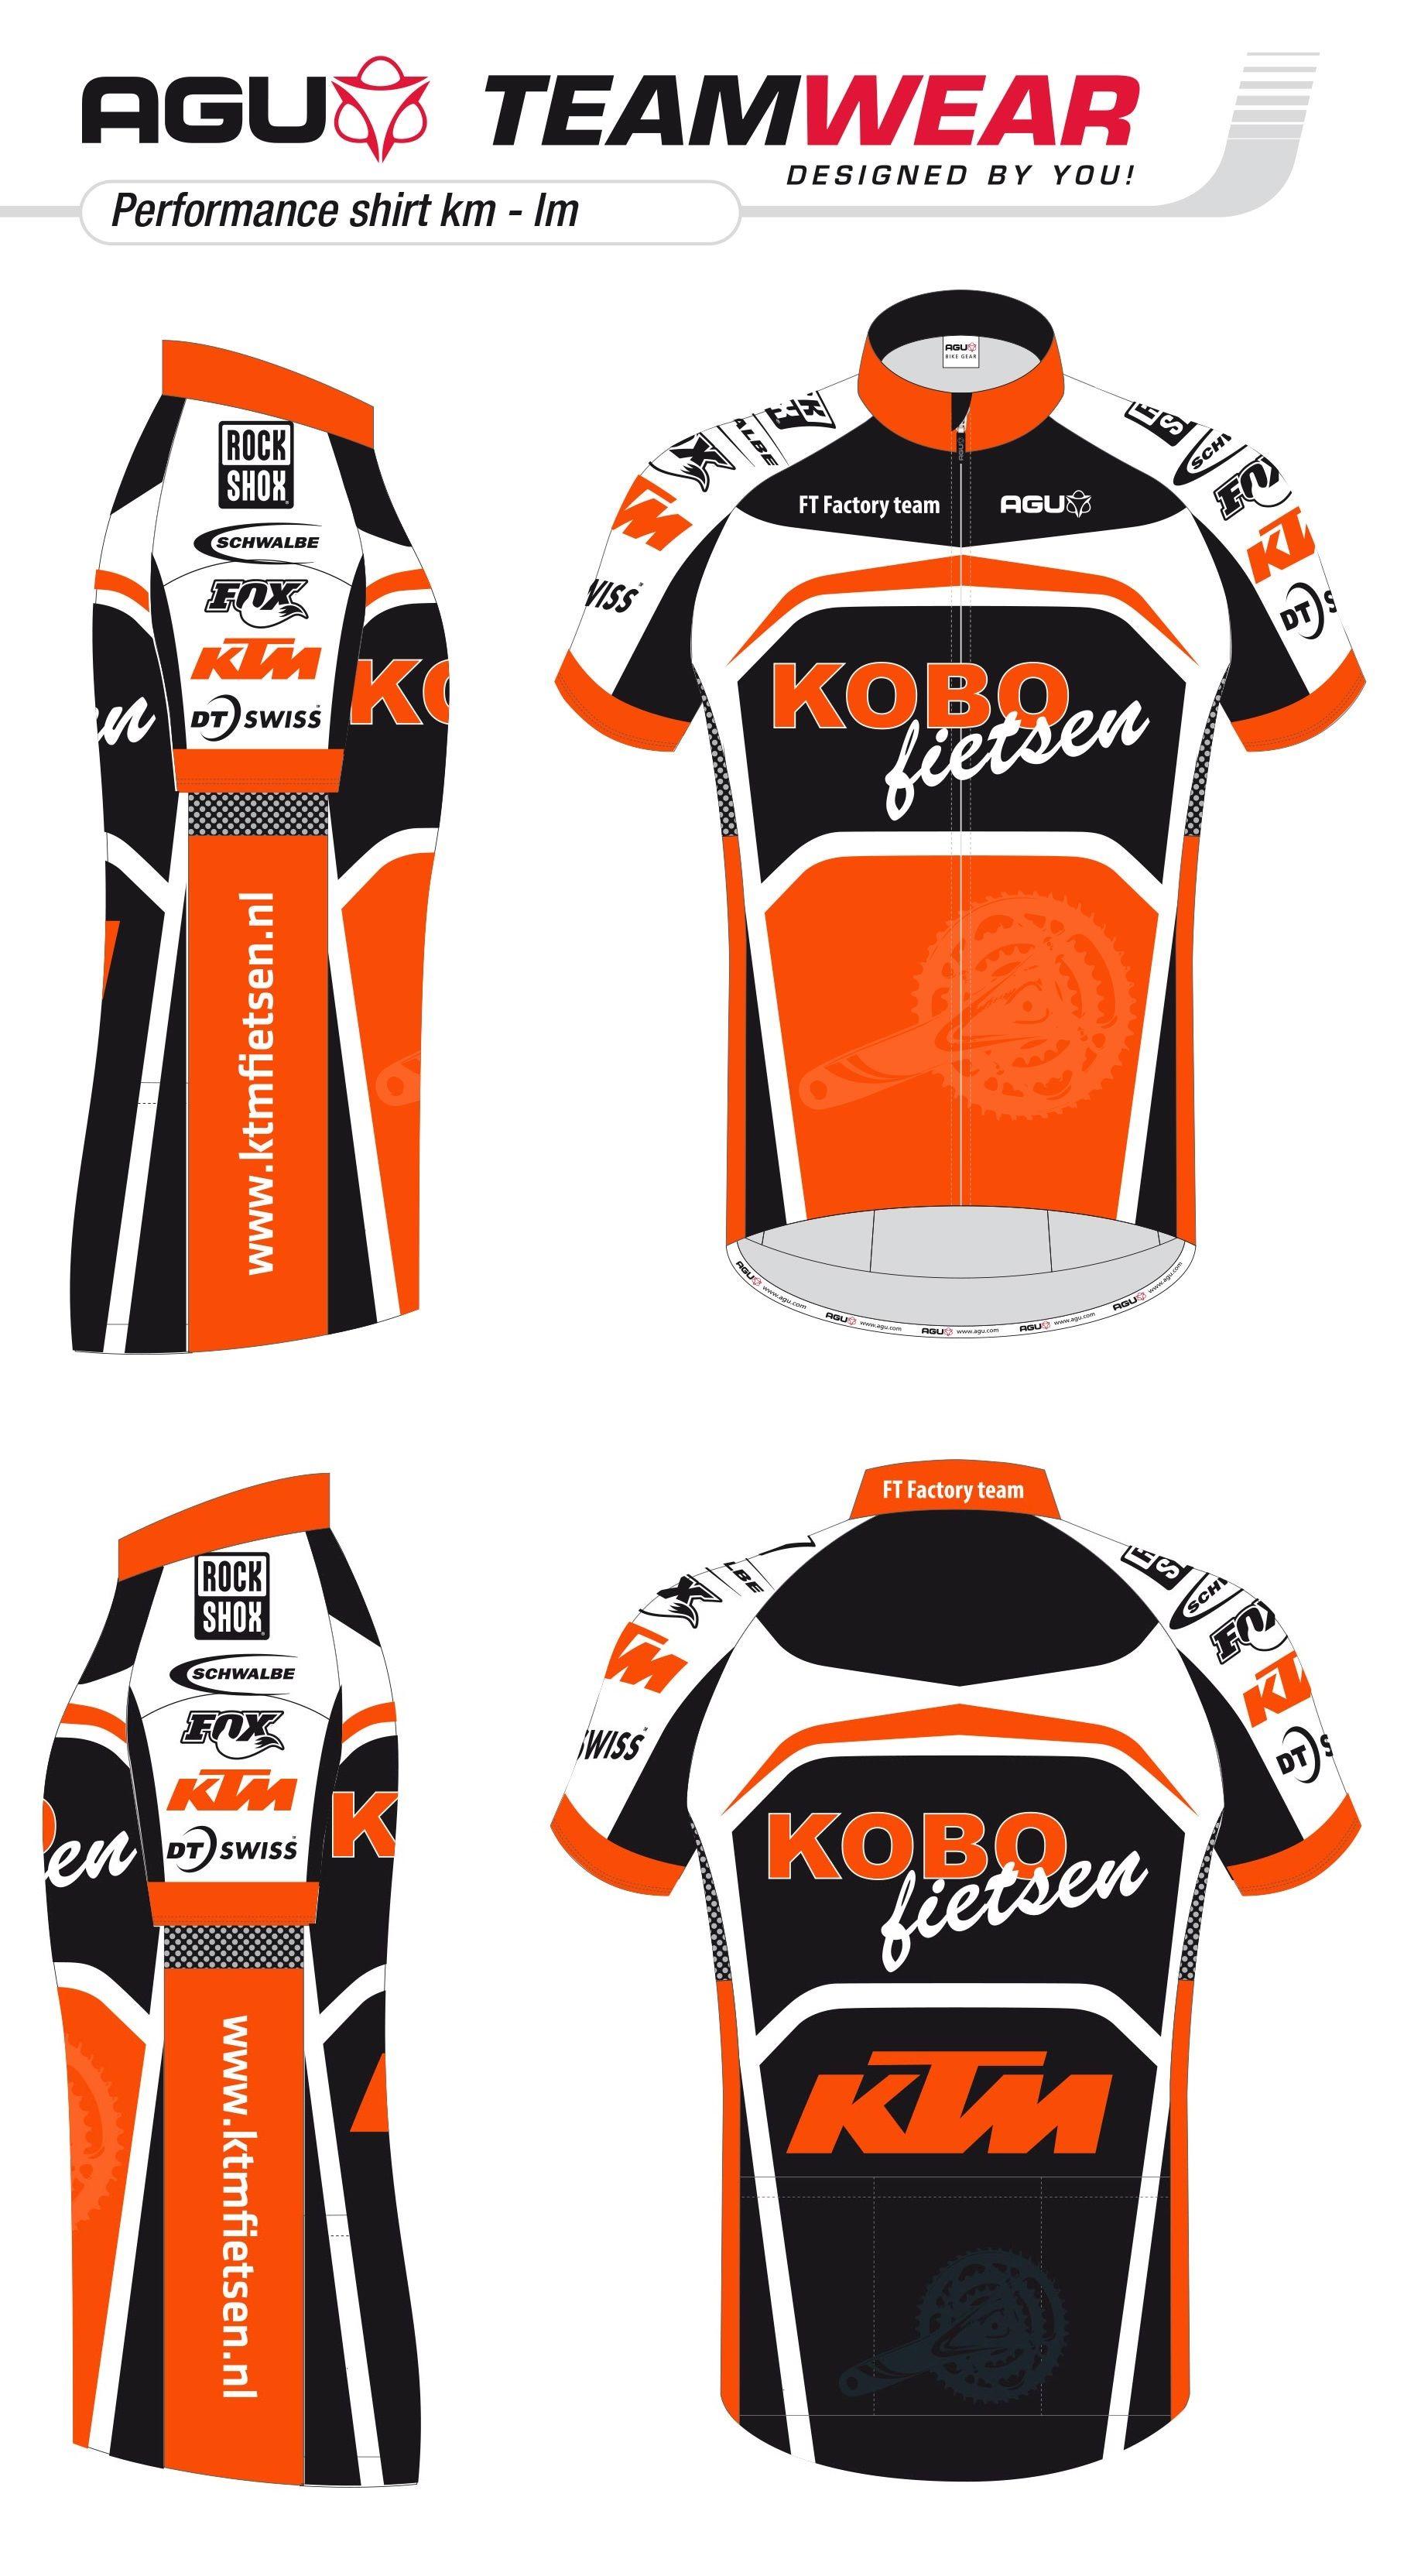 Design Your Own Cycling Jersey By Agu Customized Cycling Apparel Designed For Kobo Fietsen Drachten Netherl Camiseta Esportiva Camisas De Futebol Futebol